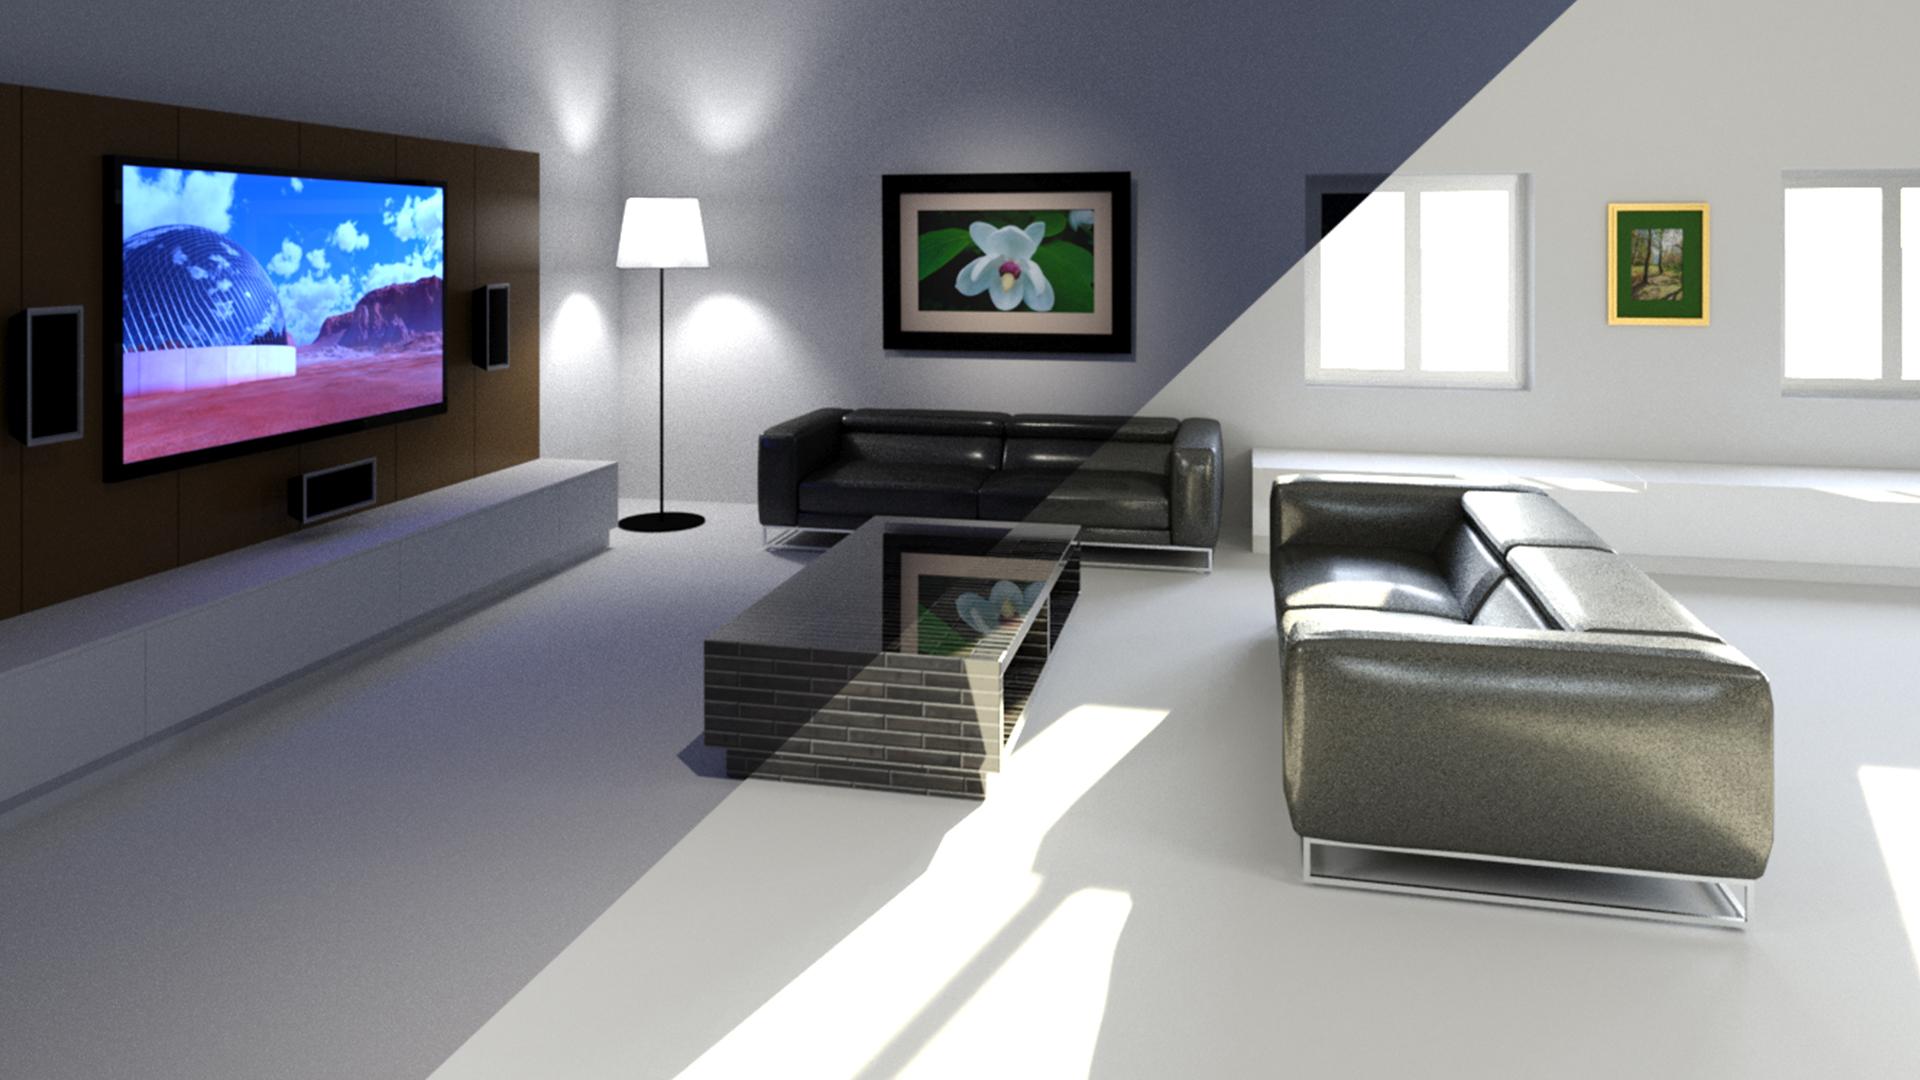 3ds Max Advanced Lighting